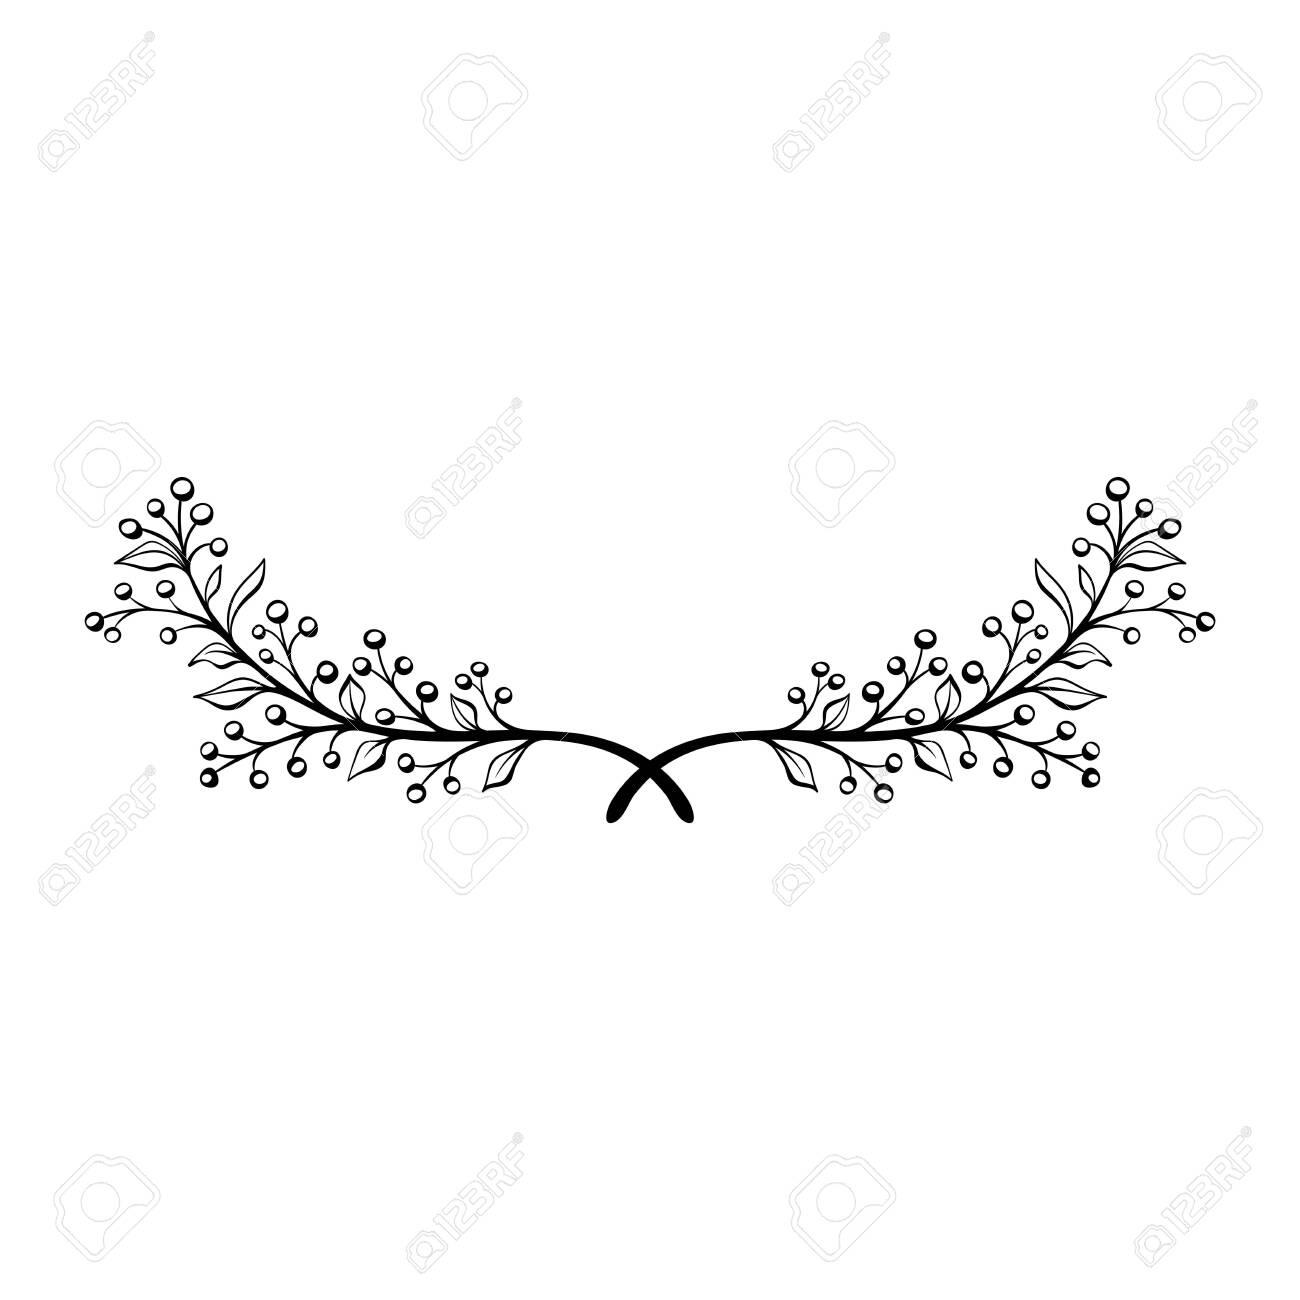 Hand drawn doodle floral wreath. Decorative element. Floral divider. Rustic laurel - 130124224